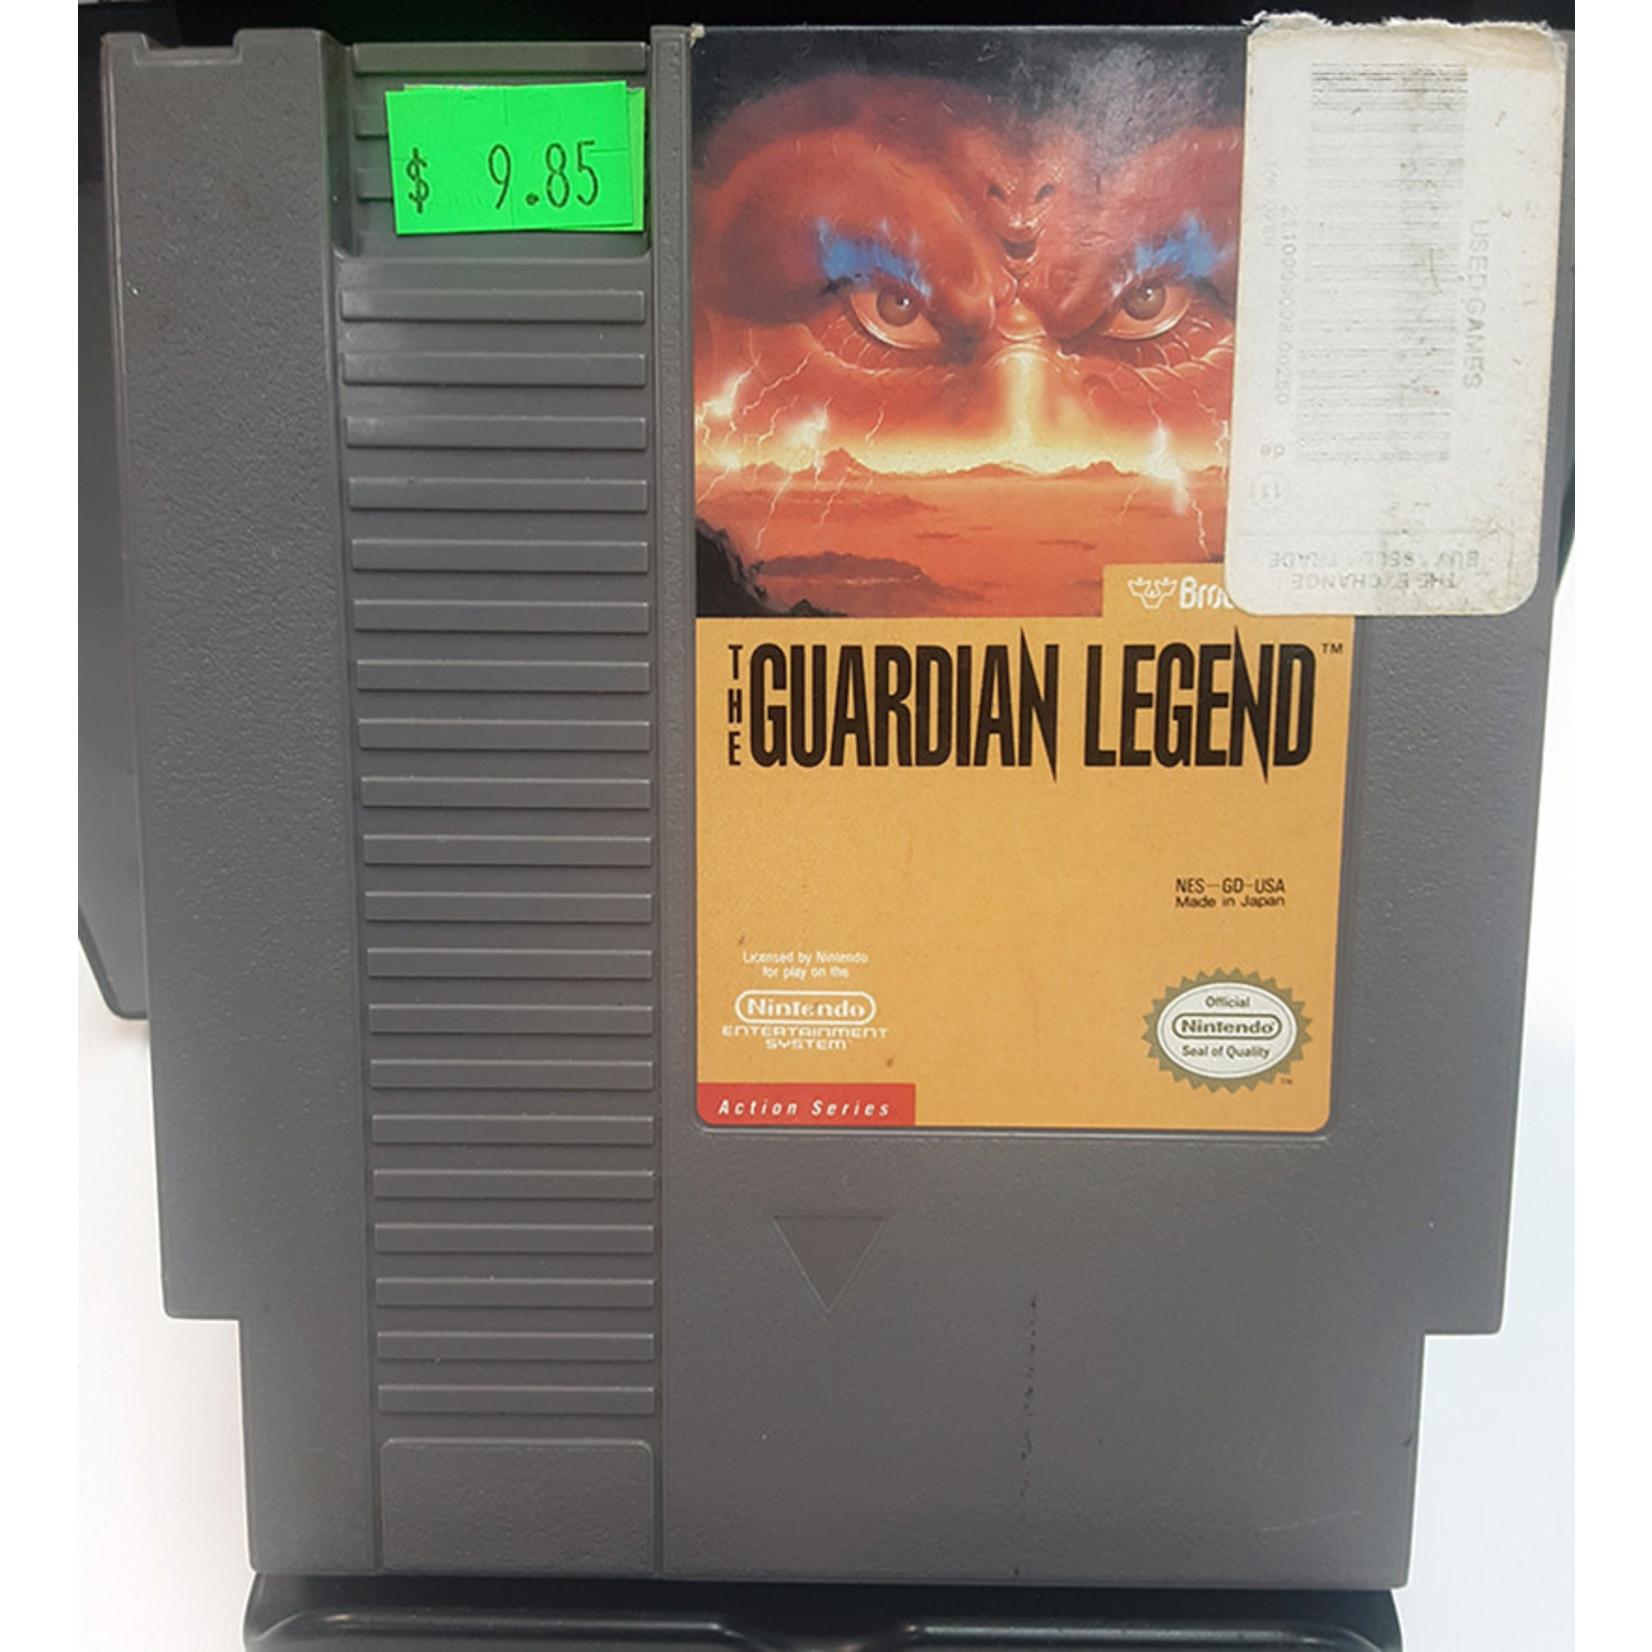 NESu-The Guardian Legend (cartridge)